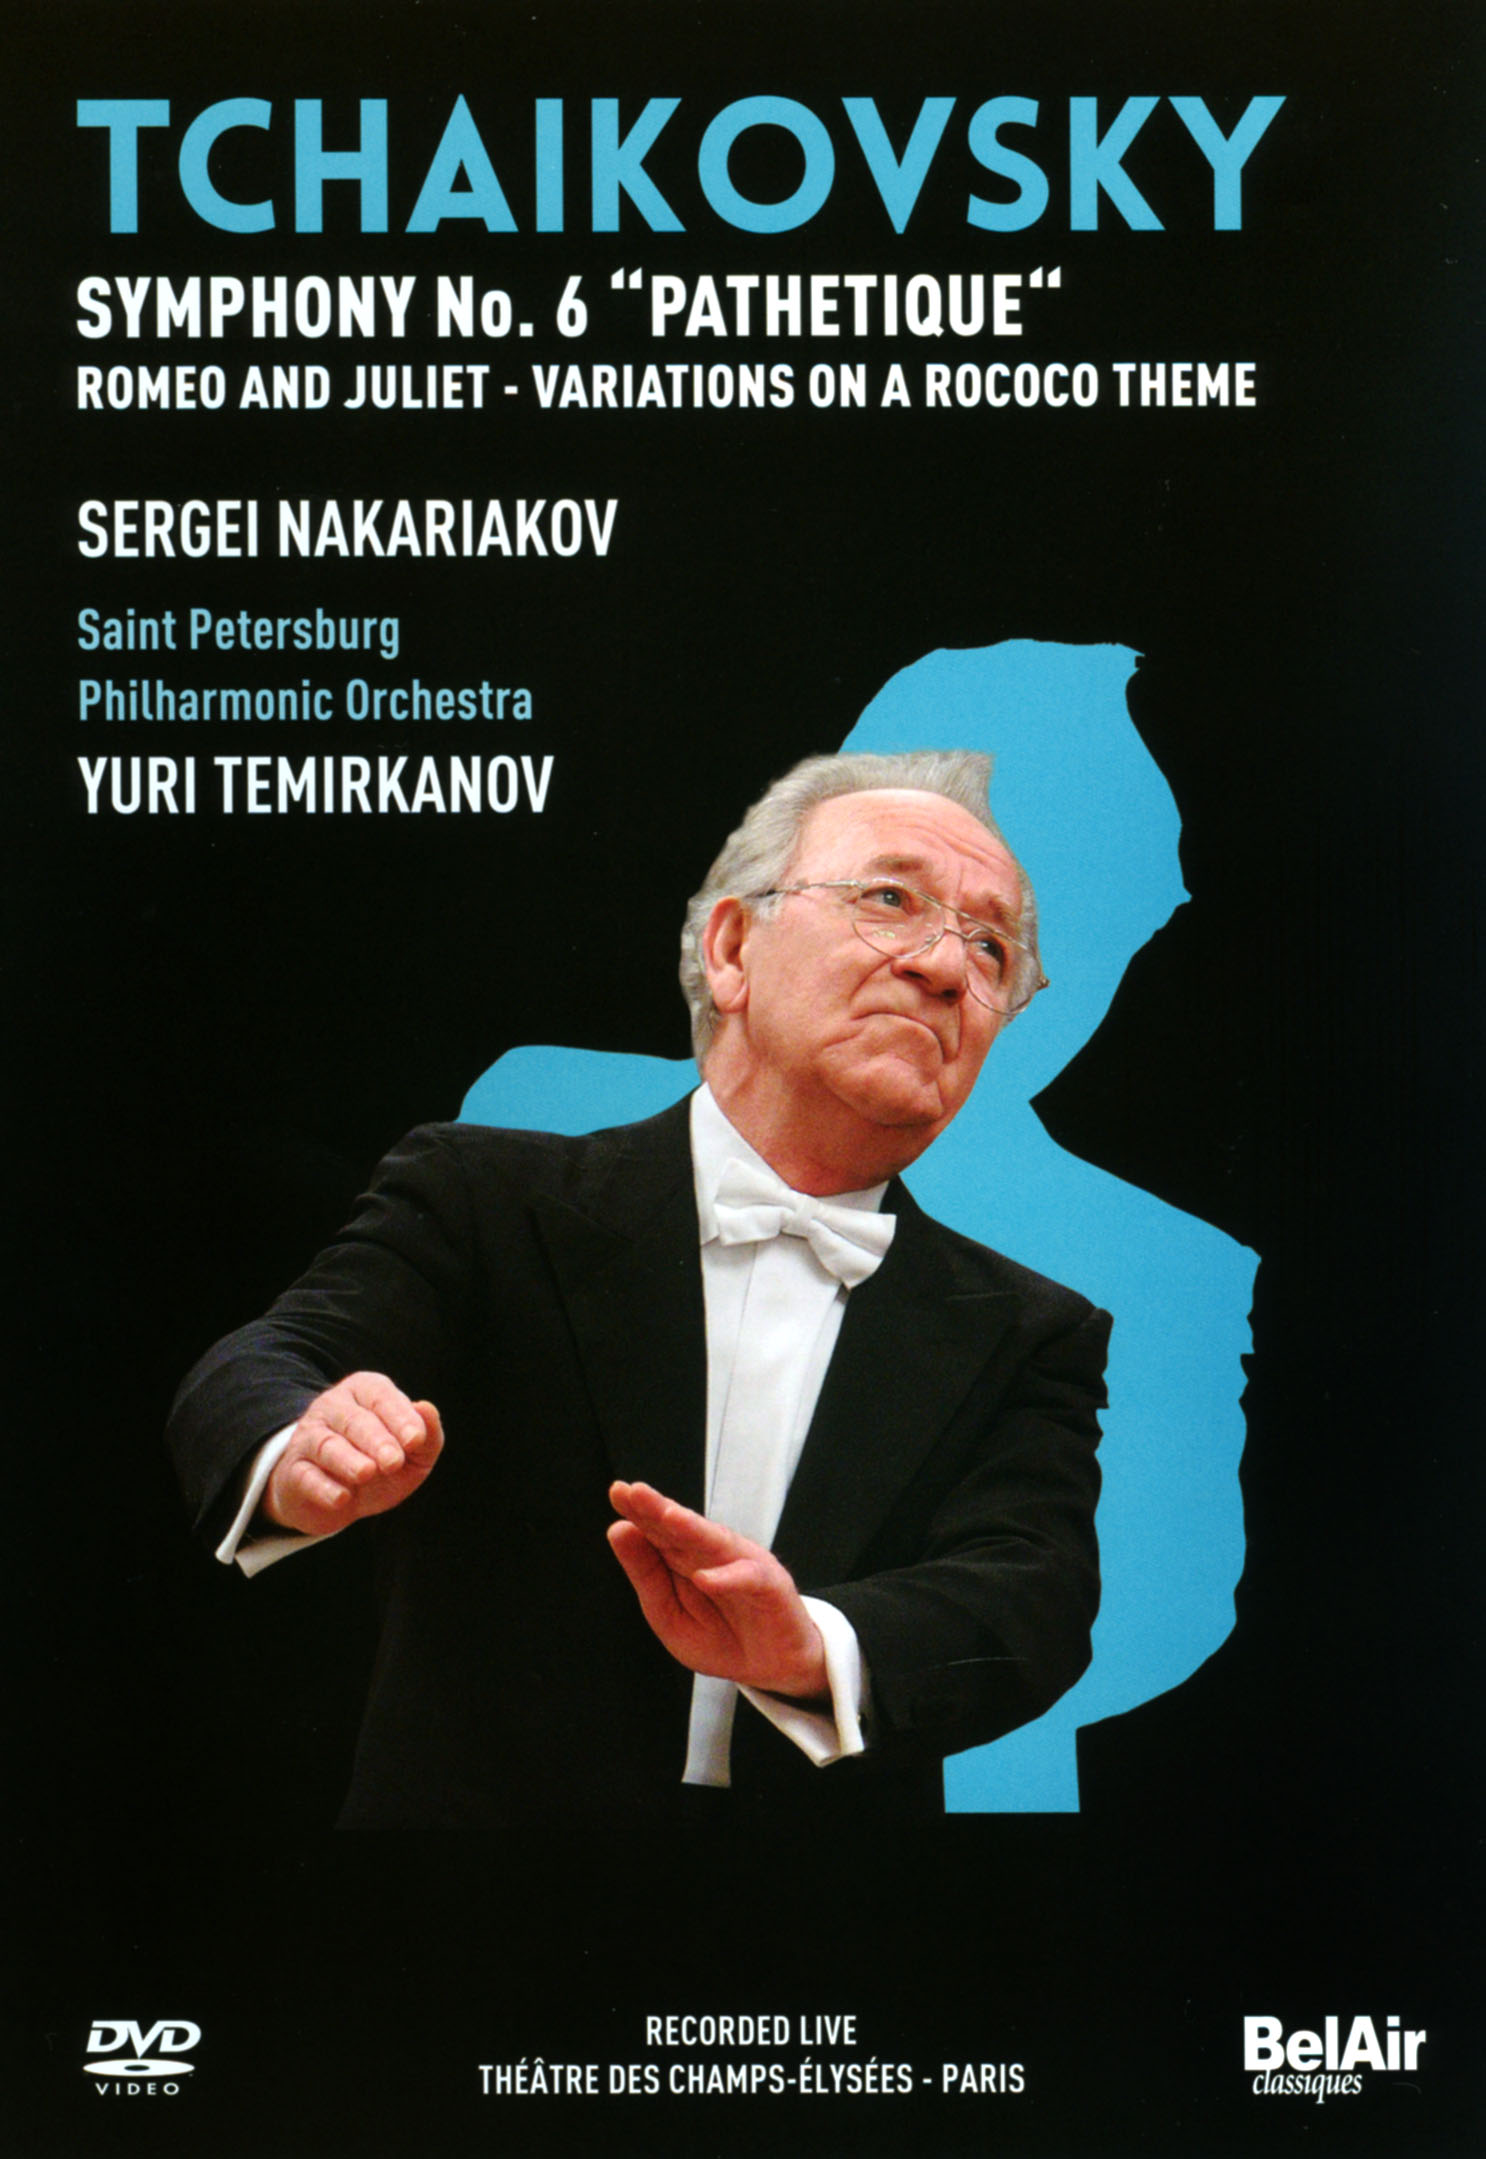 Saint Petersburg Philharmonic Orchestra/Yuri Temirkanov: Tchaikovsky - Symphony No. 6